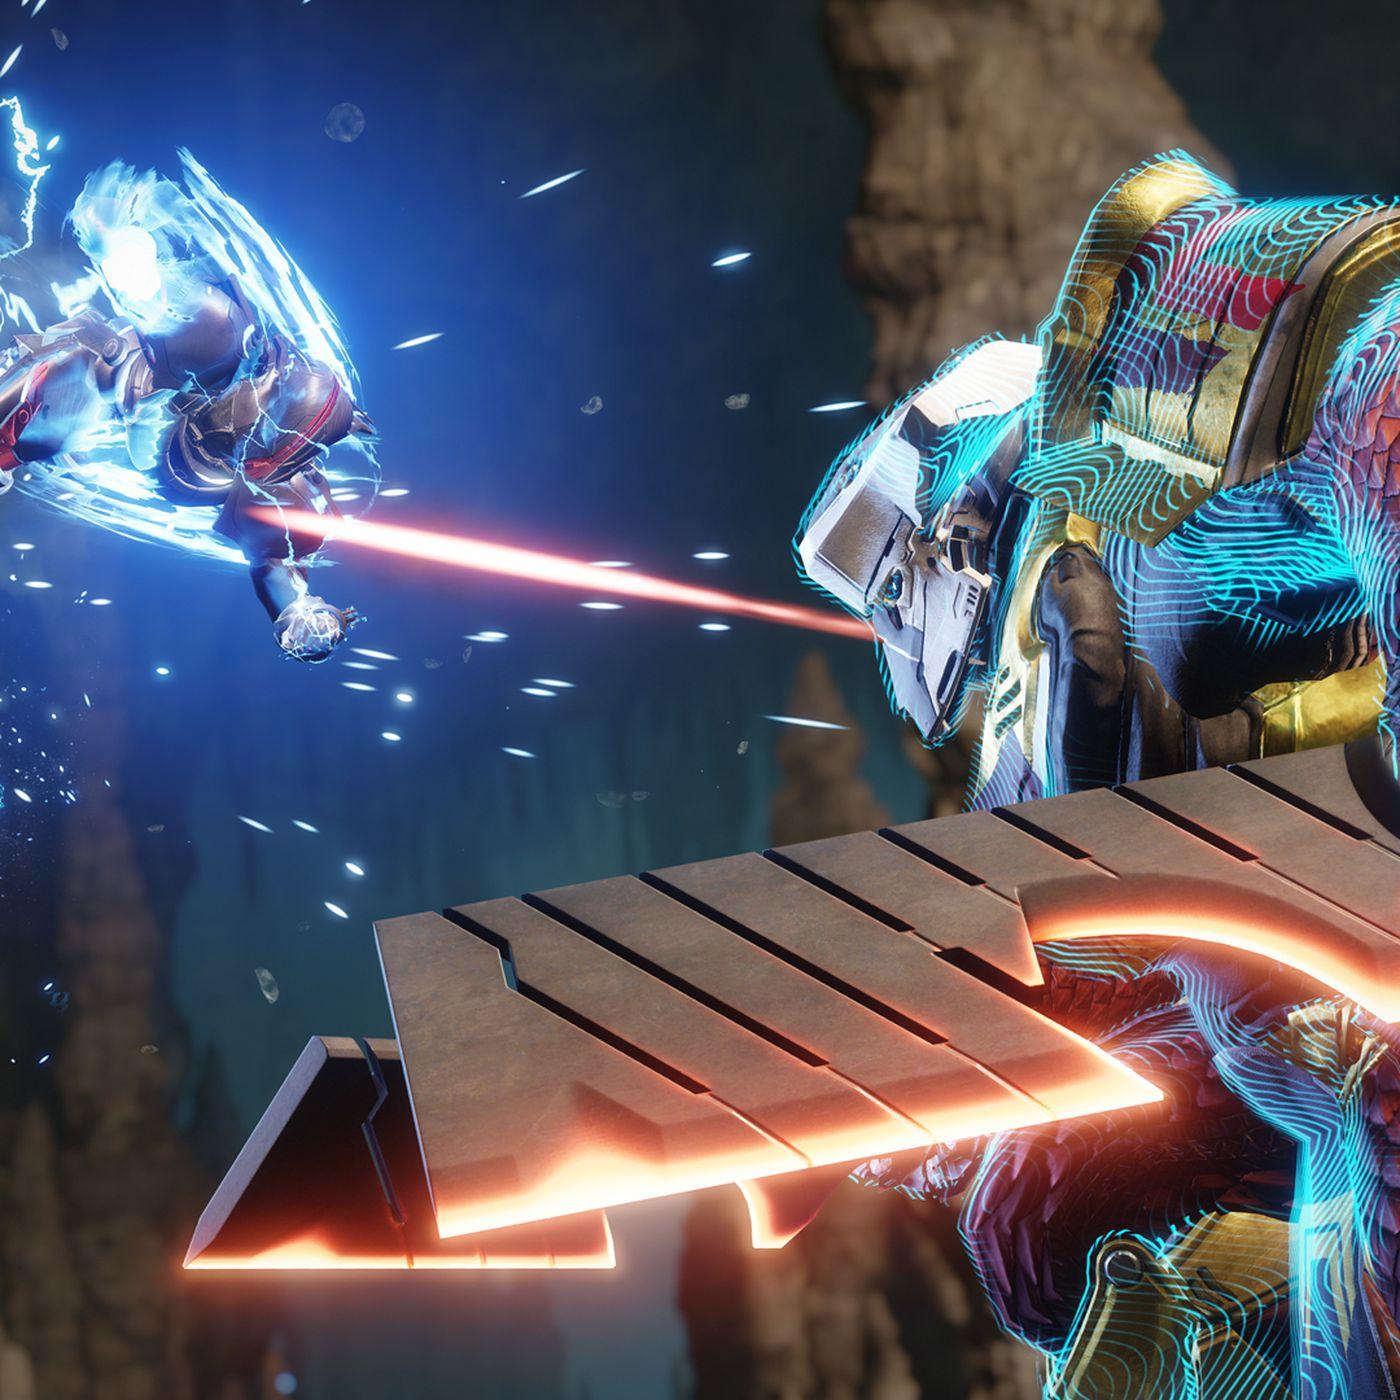 Destiny 2 Black Armory: Everything we know Bungie's next